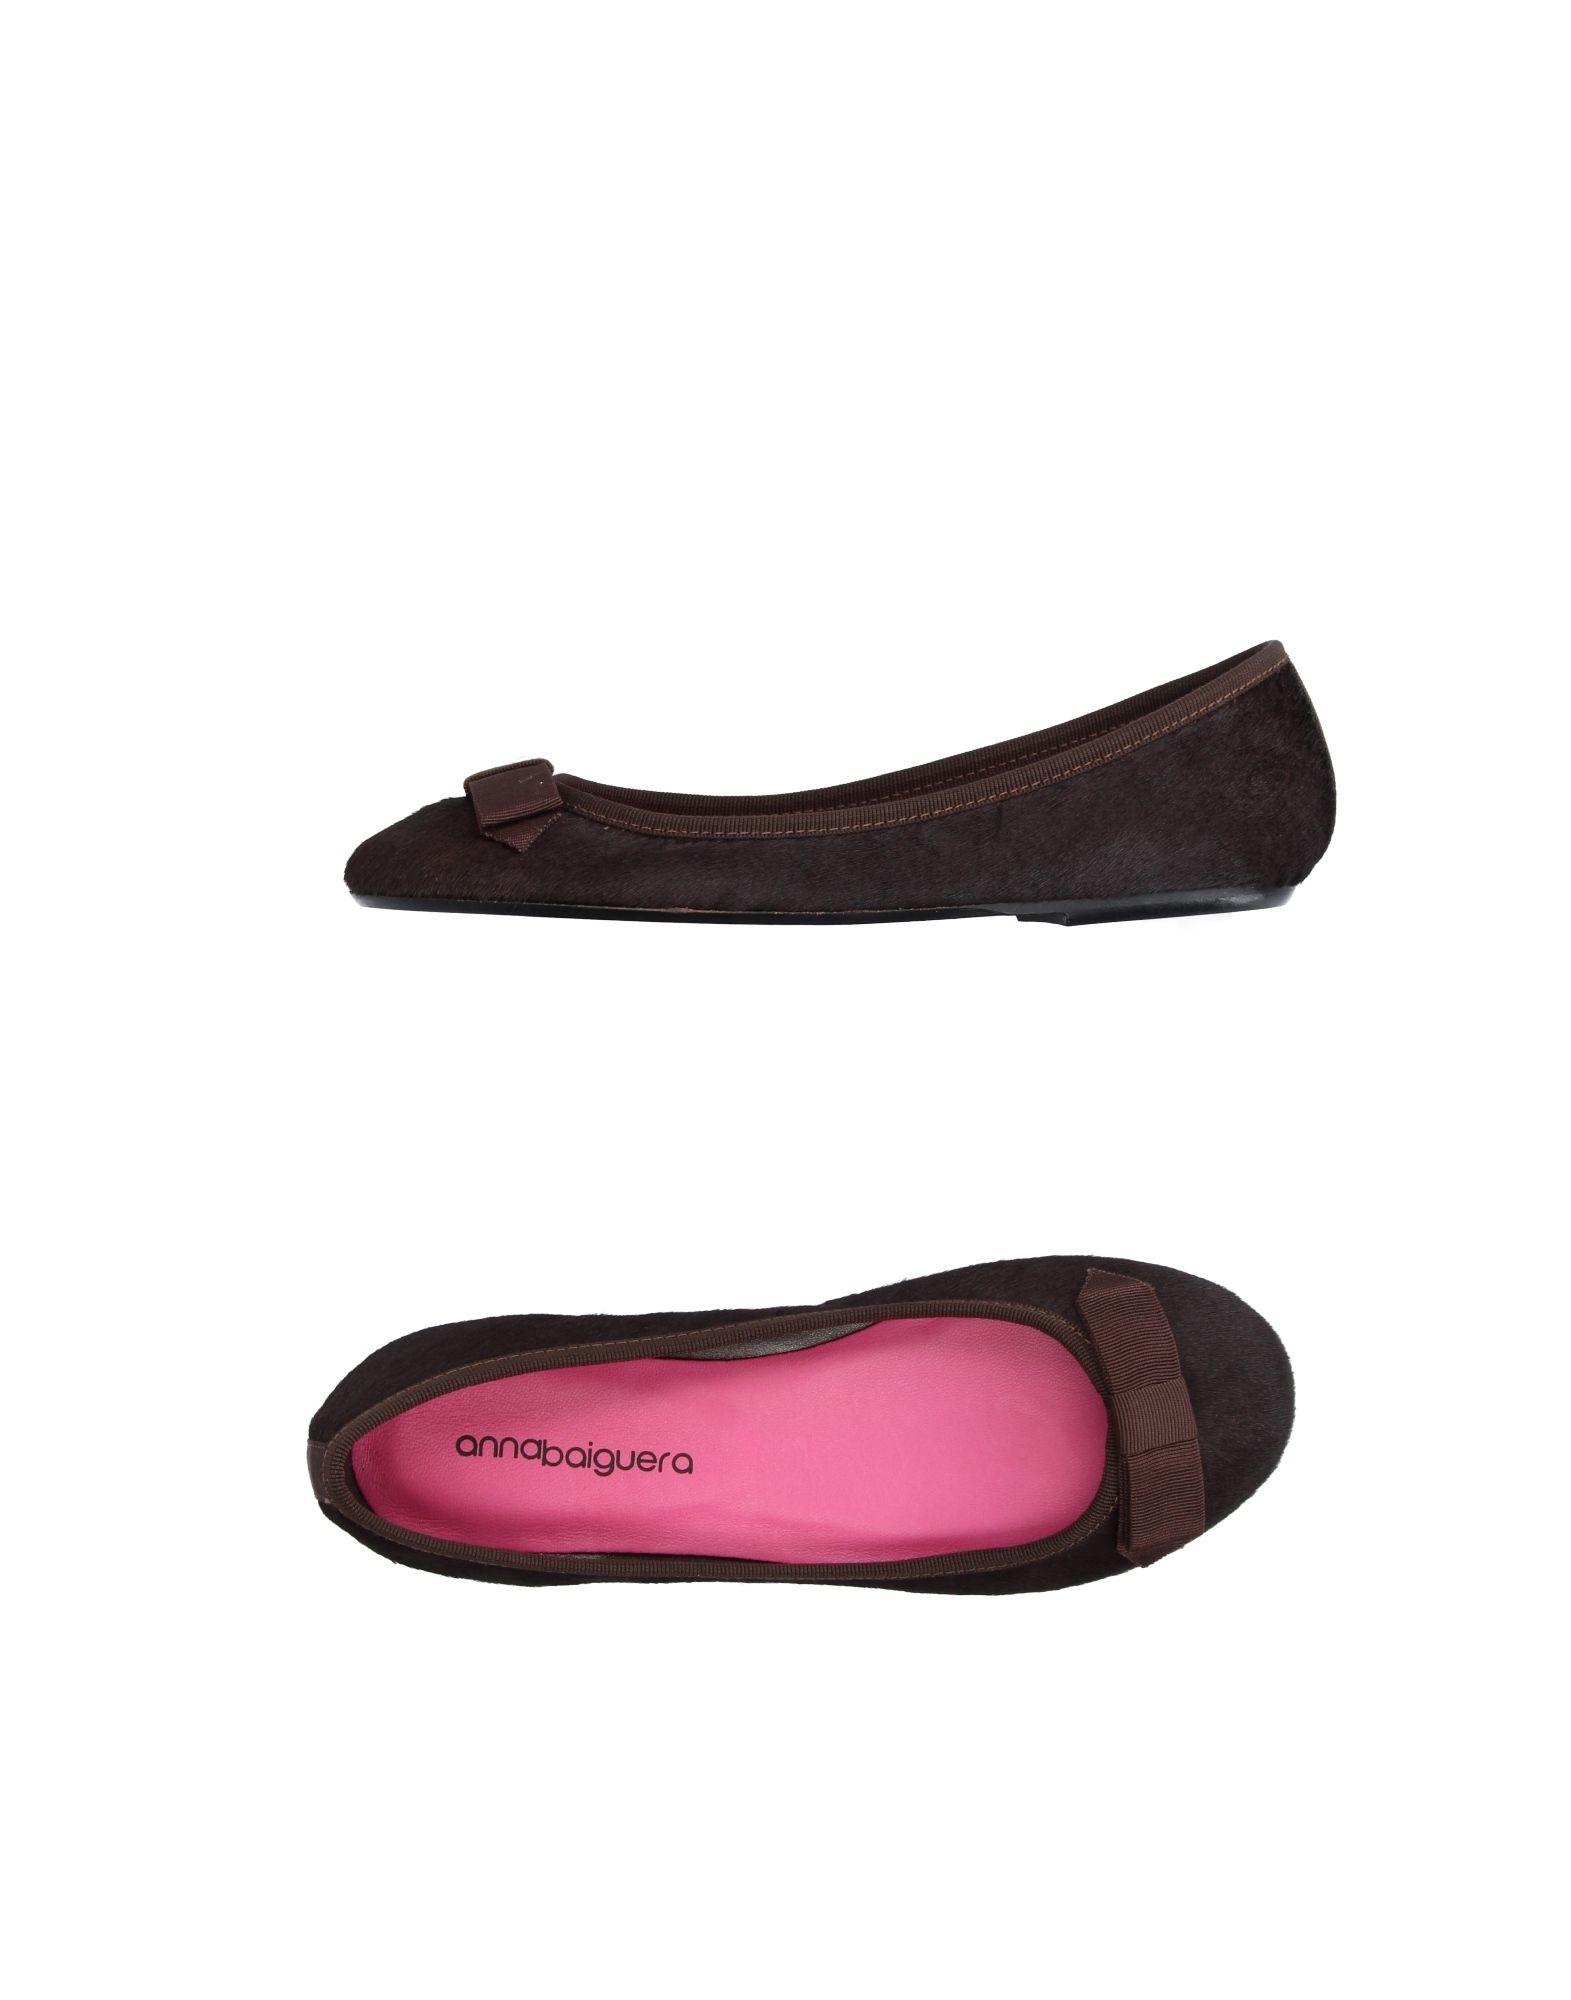 Anna Baiguera Ballerinas Damen  11216778GU Gute Qualität beliebte Schuhe